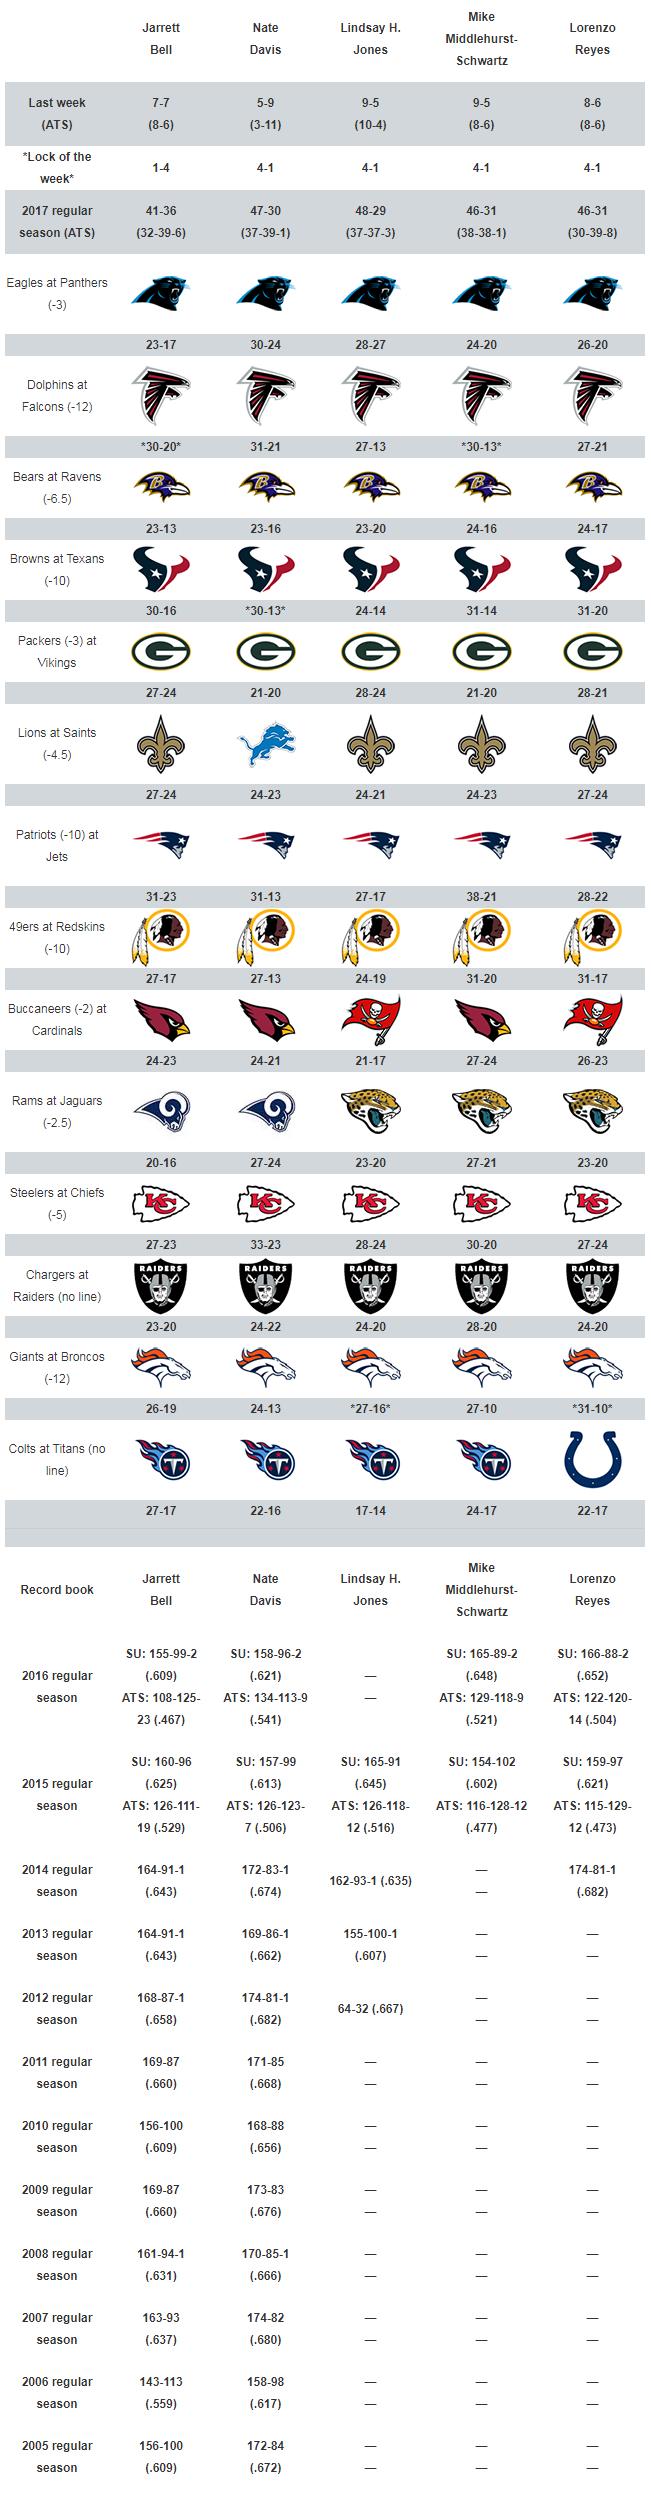 Usa Today Sports Week 6 Nfl Picks Steelers Chiefs Playoff Rematch